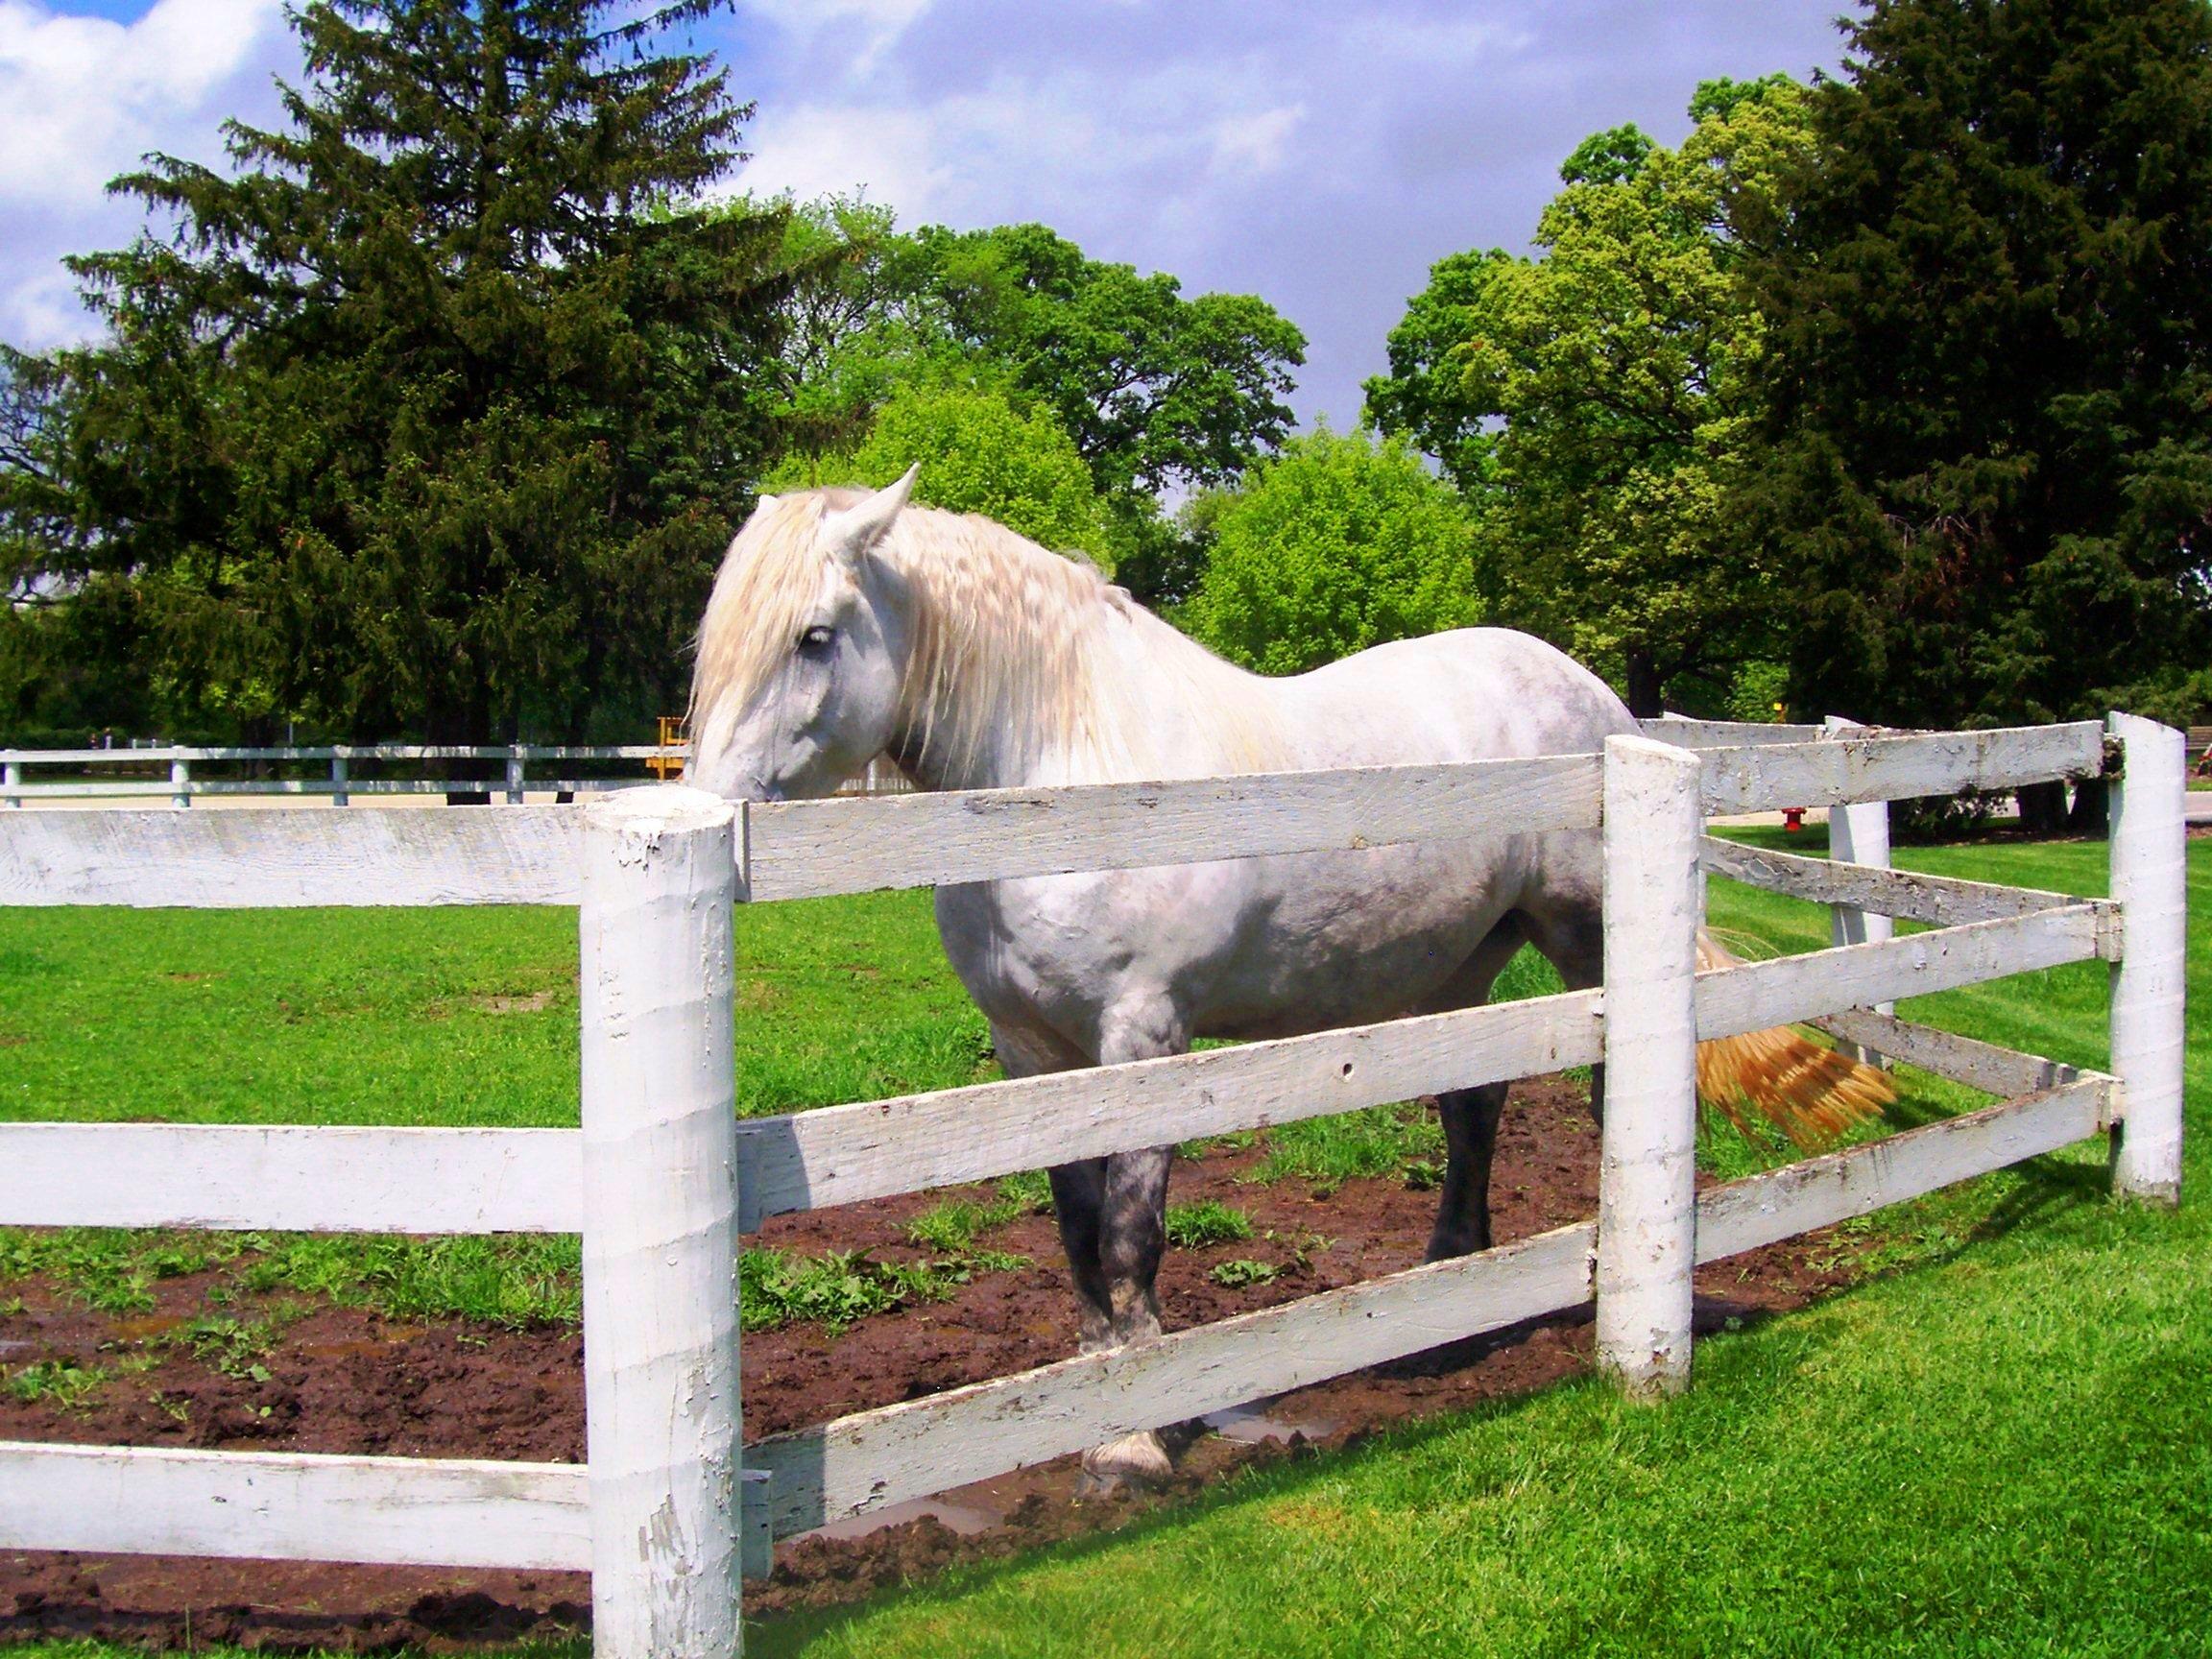 White horse white fence at equestrian center jpg